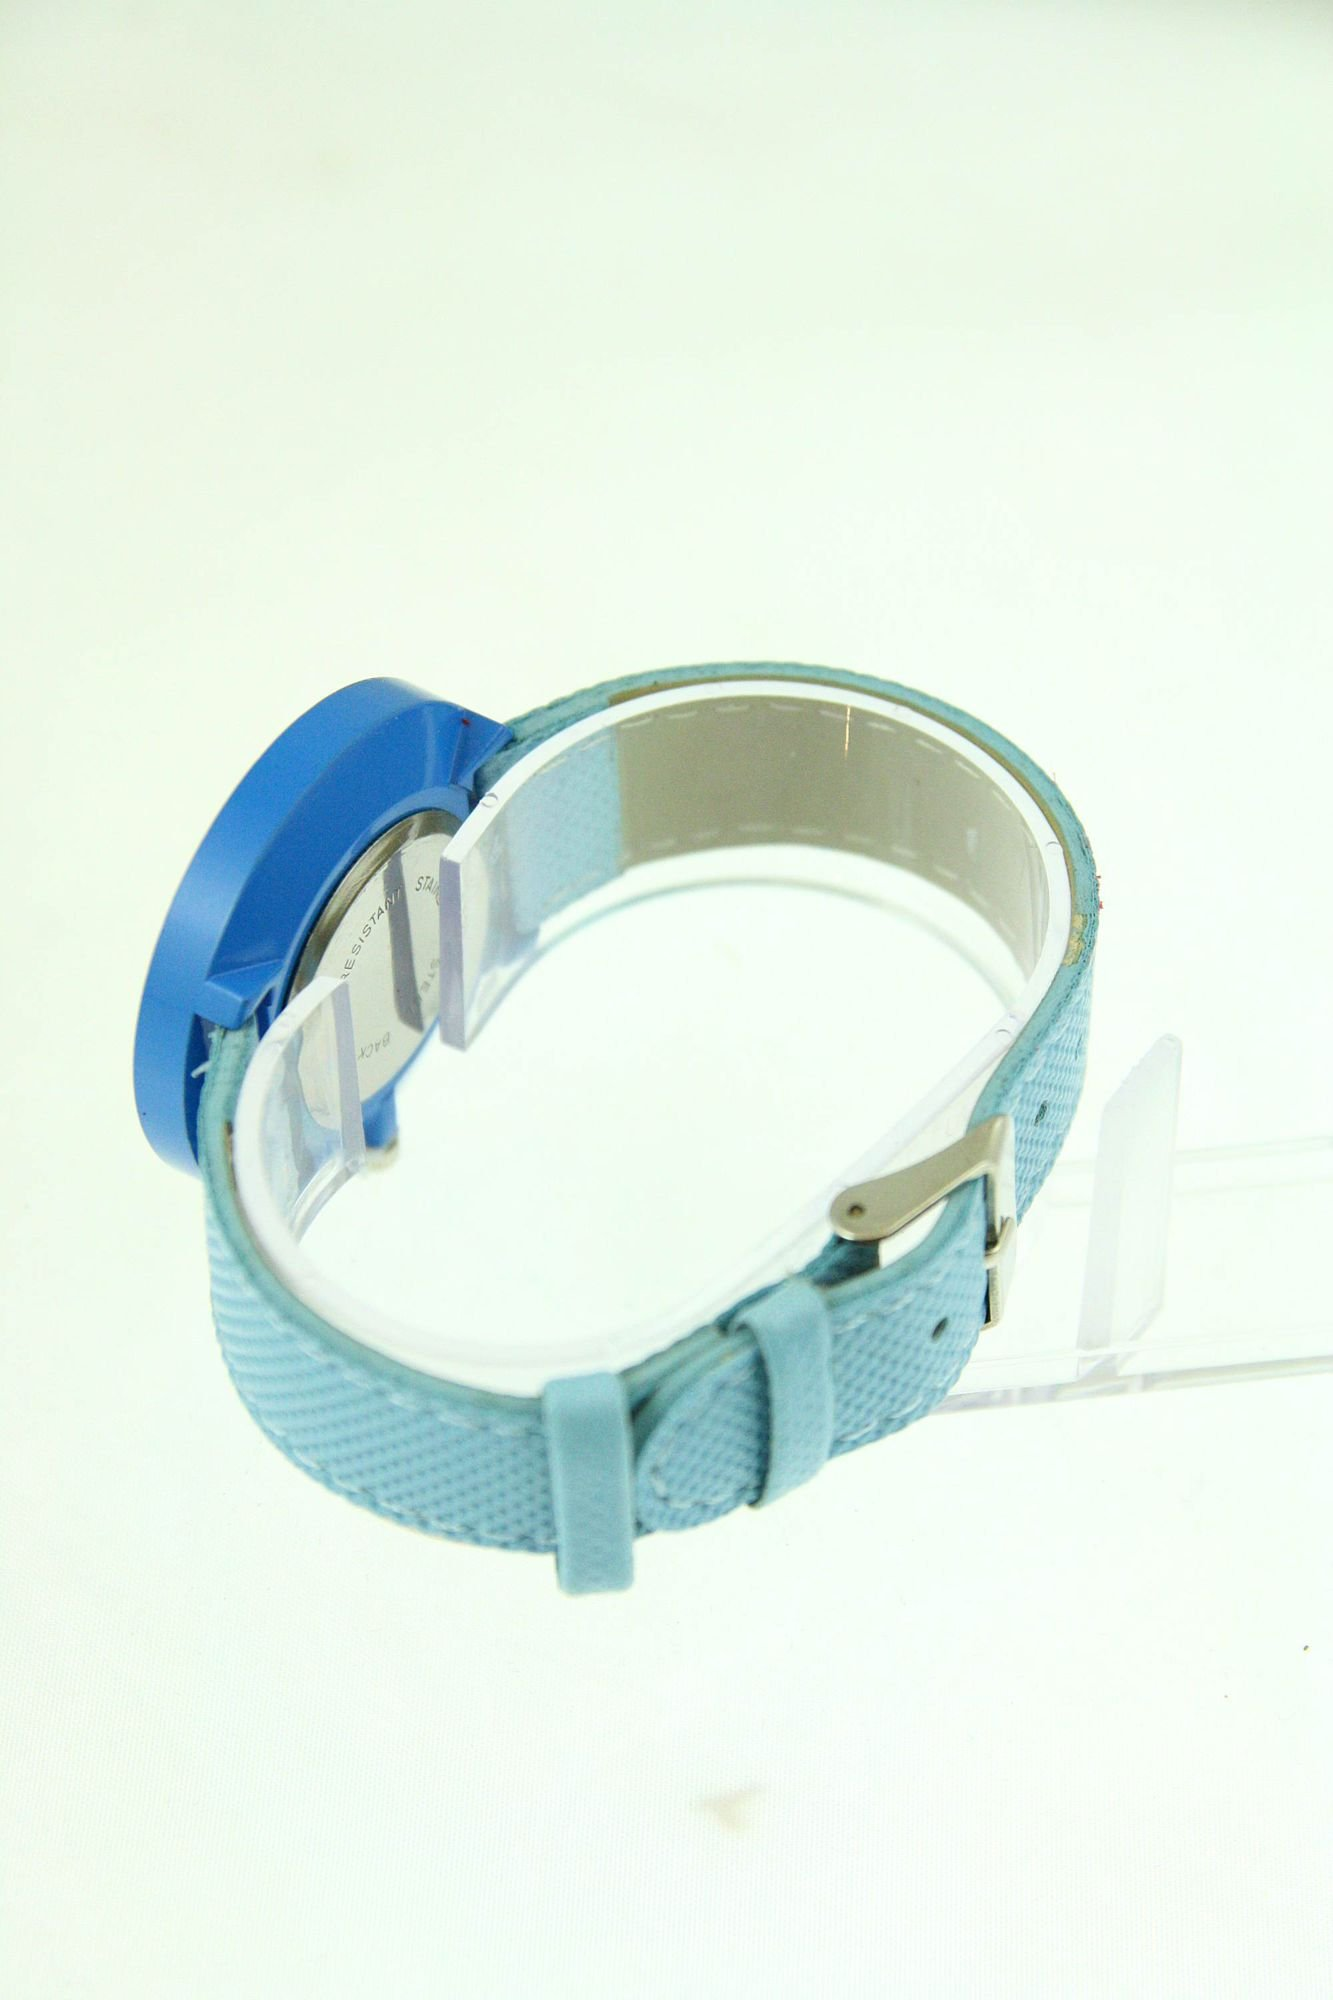 Niebieski zegarek damski na pasku                                  zdj.                                  3